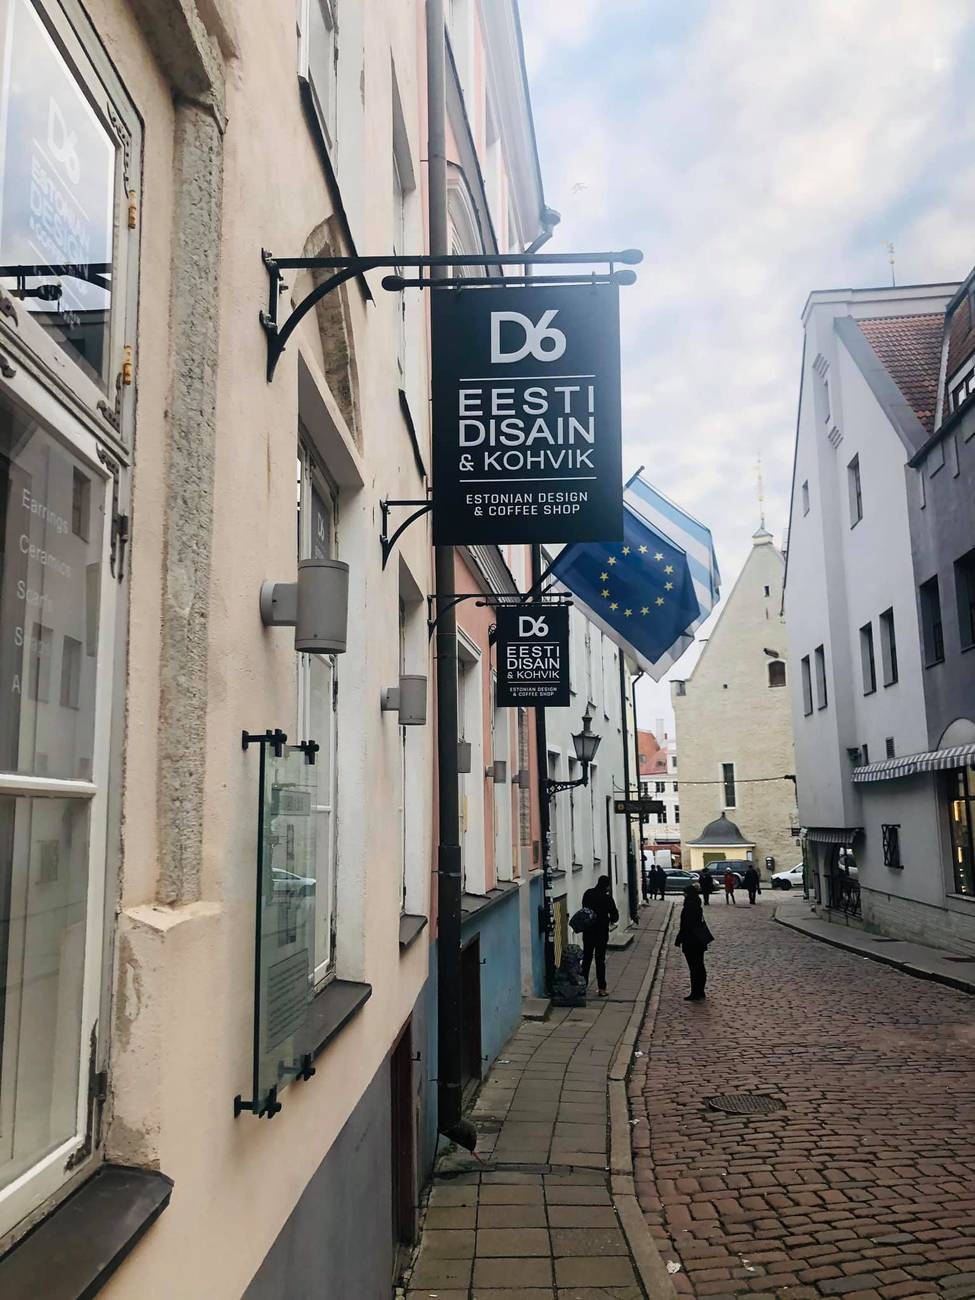 D6 Estonian Design&Coffee Shop in Tallinn,Estonia